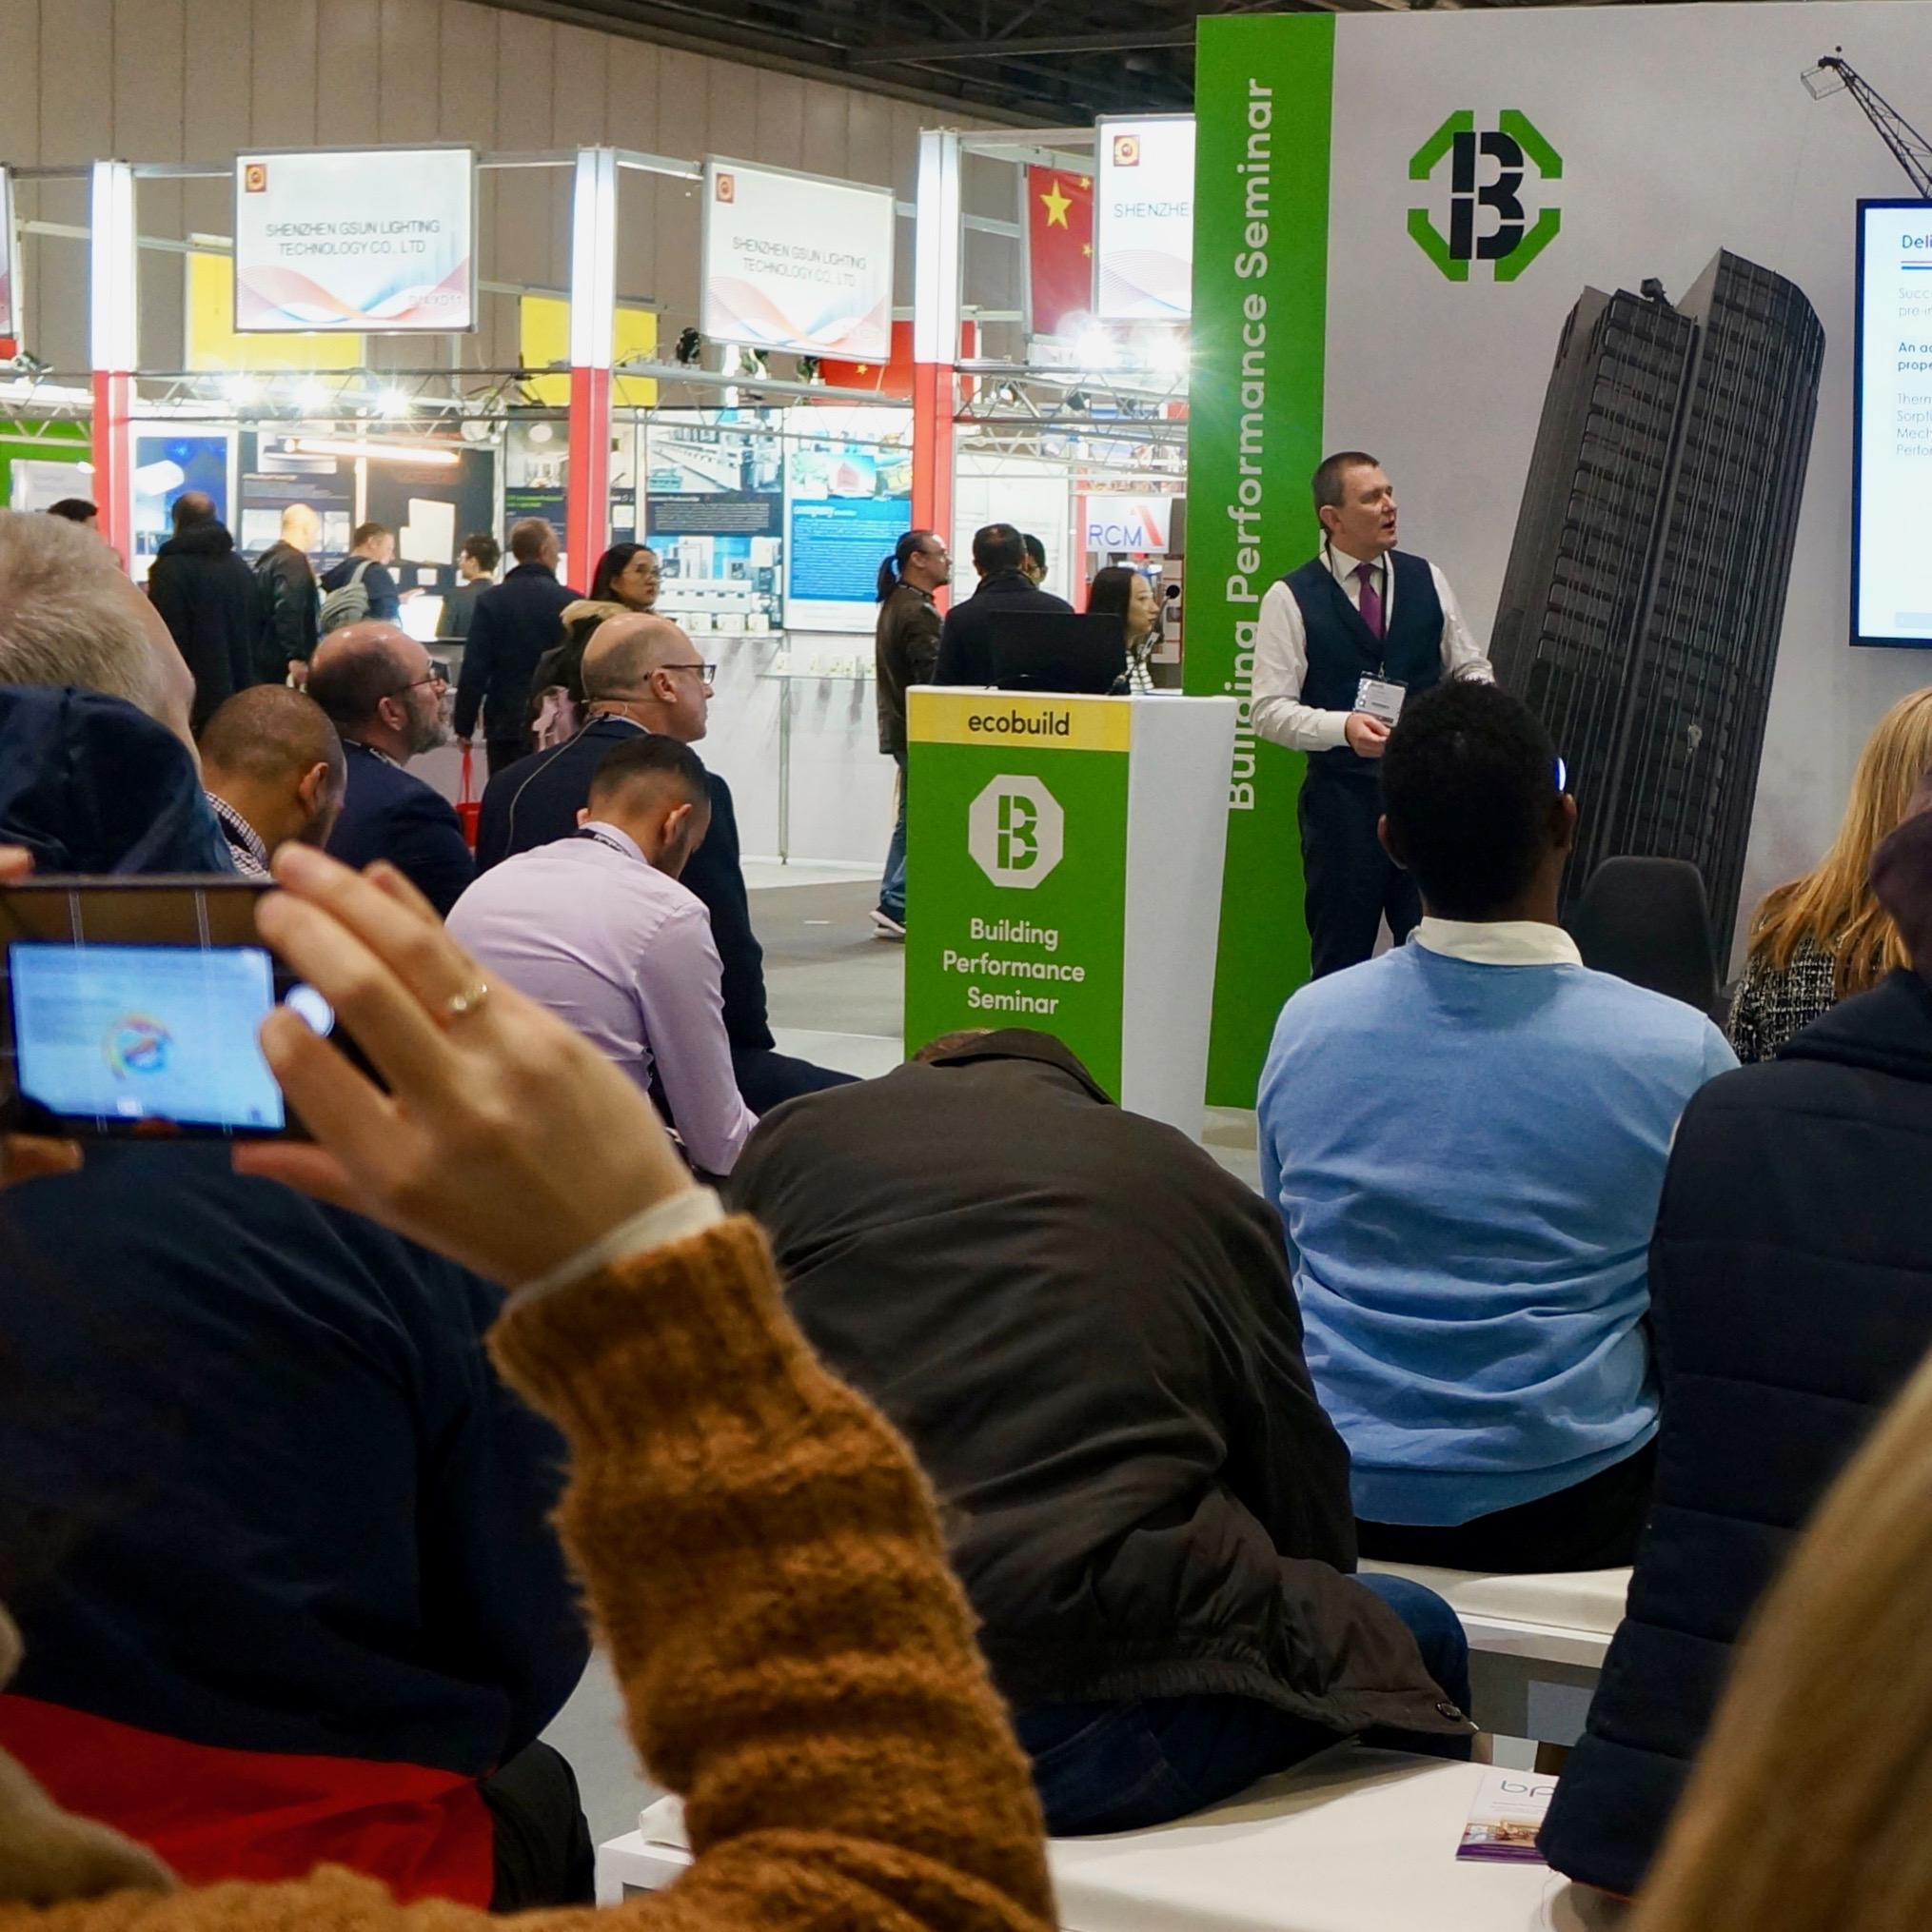 Ecobuild 2018 Presentation 3 - Paul Valentine, BBA